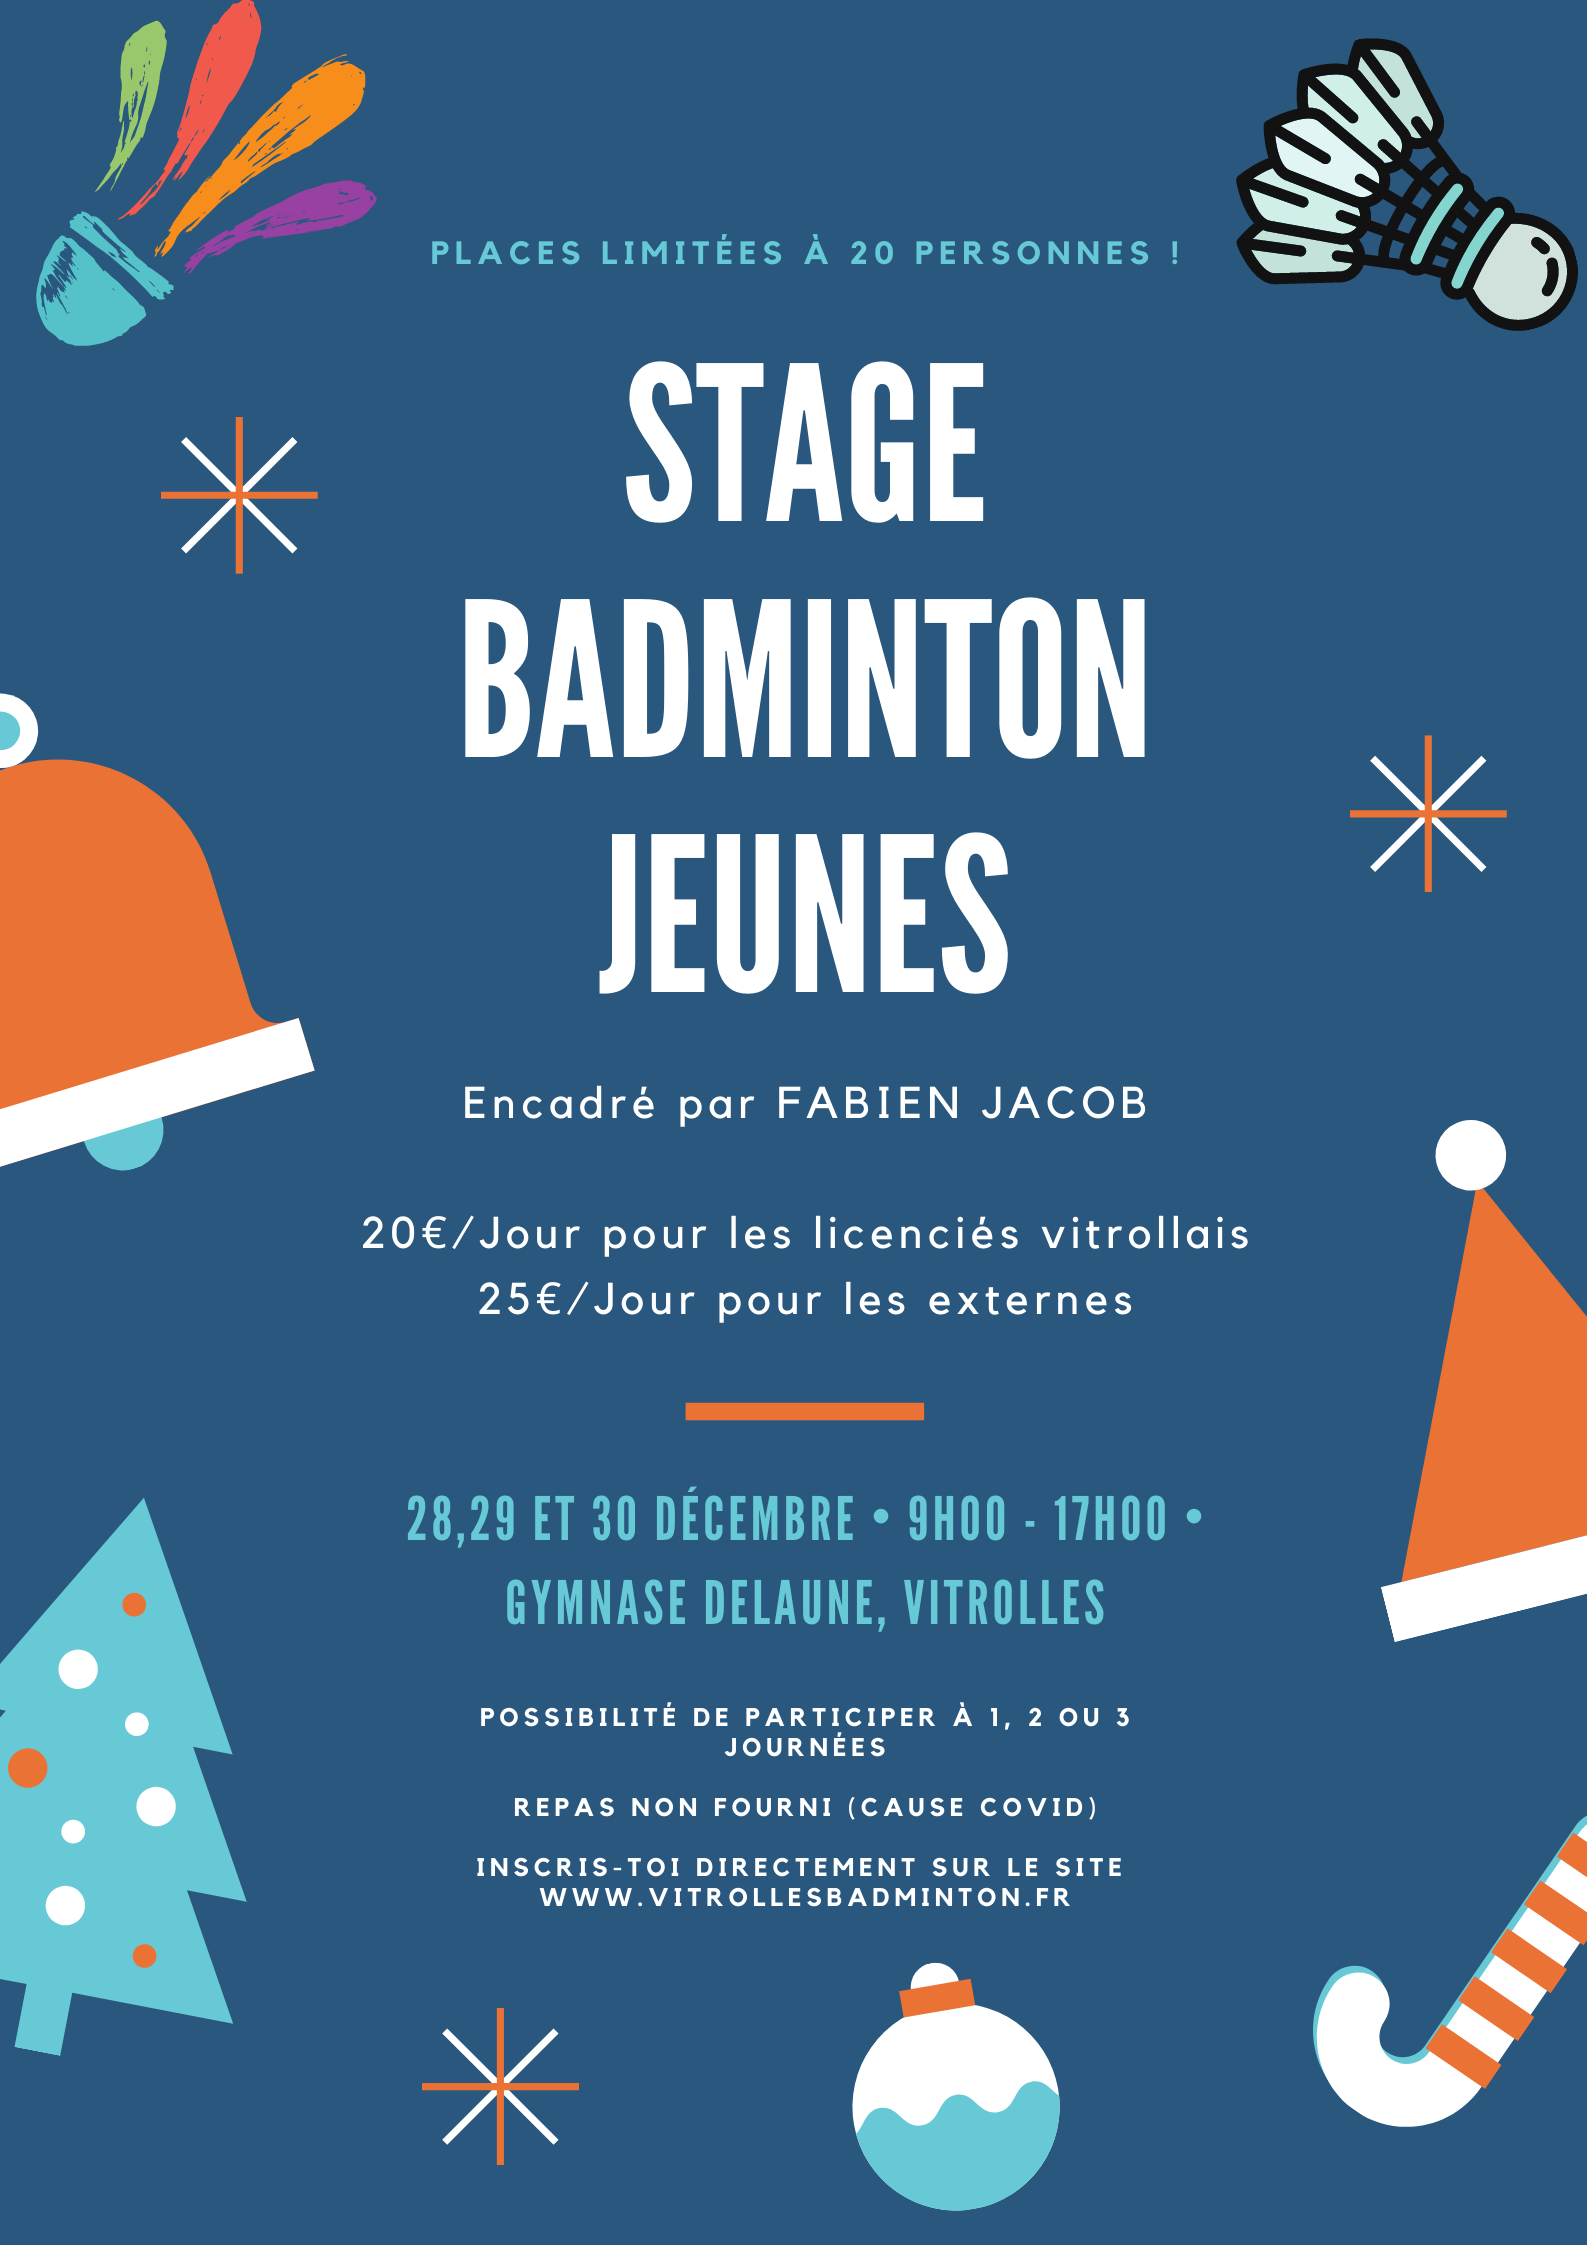 Stage de noel jeunes 2020 vitrolles badminton